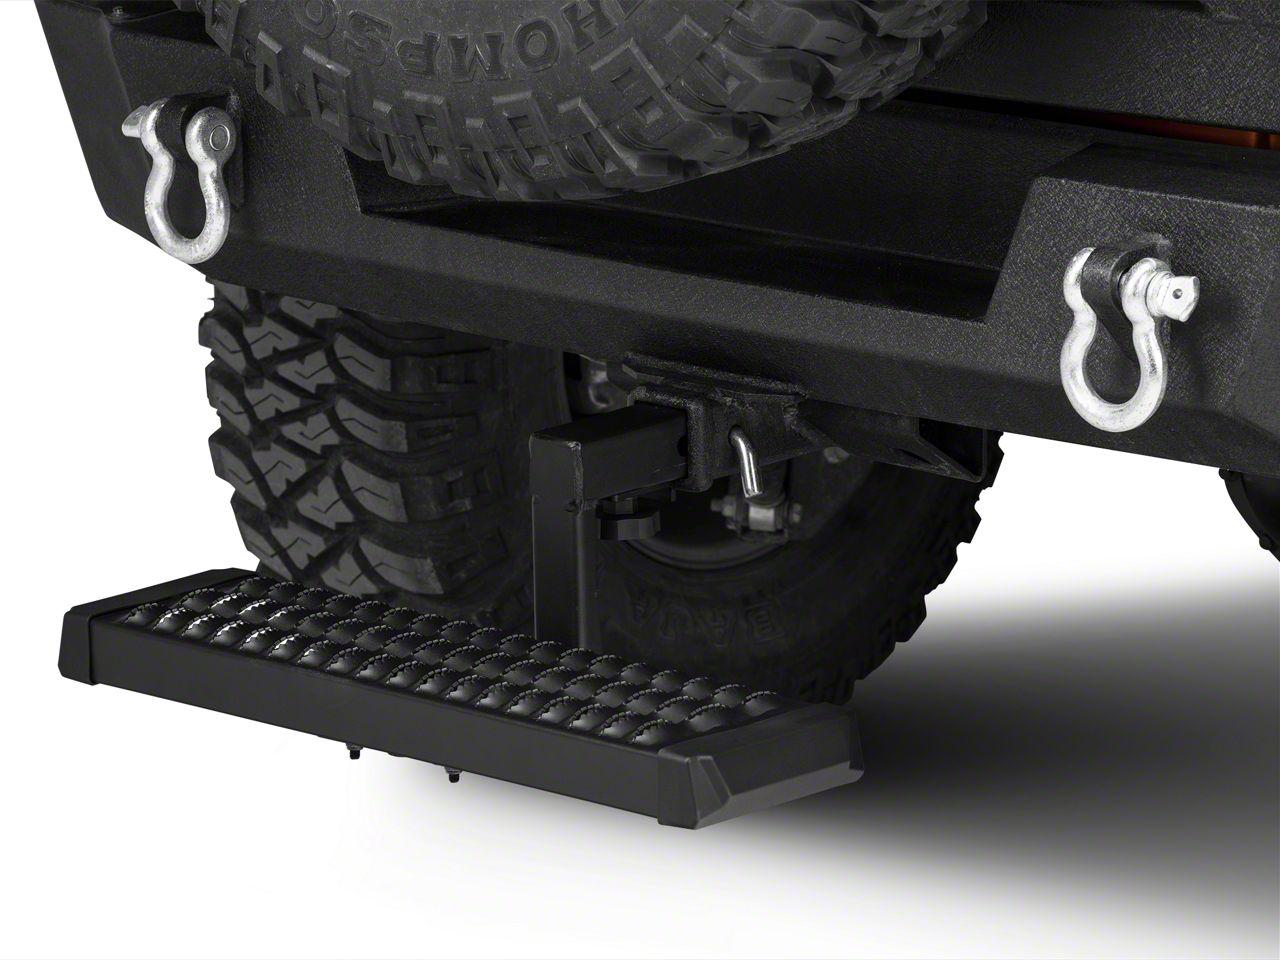 Jk jeep wrangler receiver hitches extremeterrain